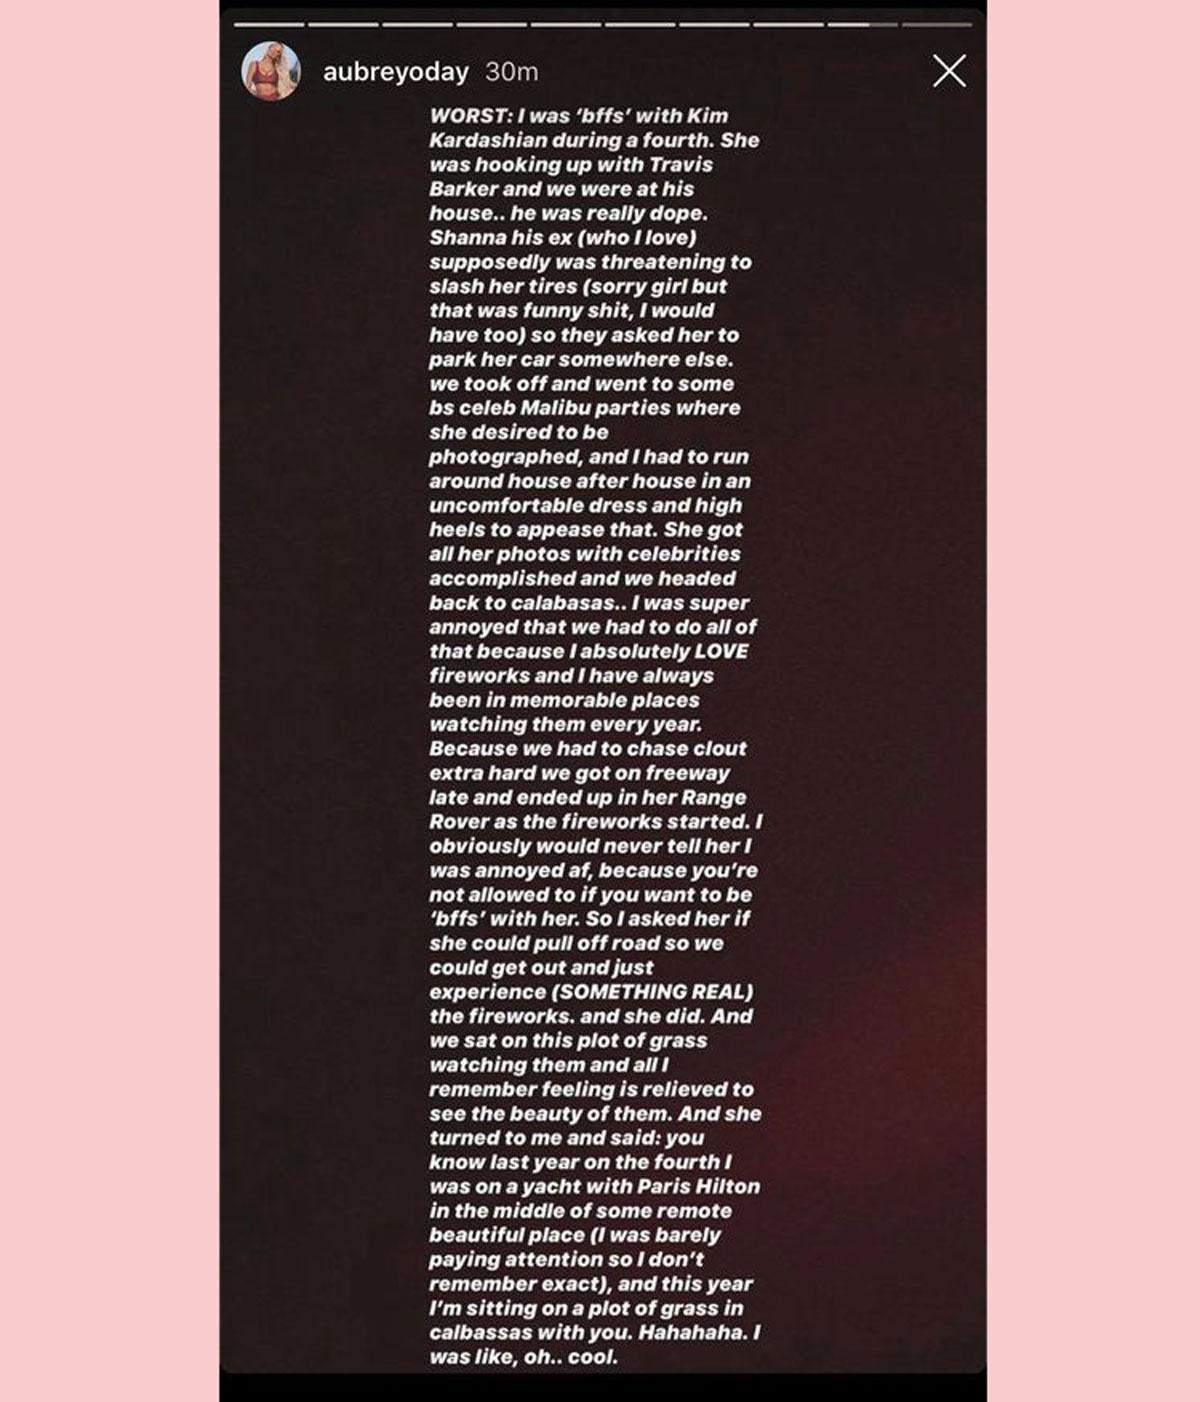 Aubrey O'Day claims Kim Kardashian and Travis Barker definitely used to hook up!